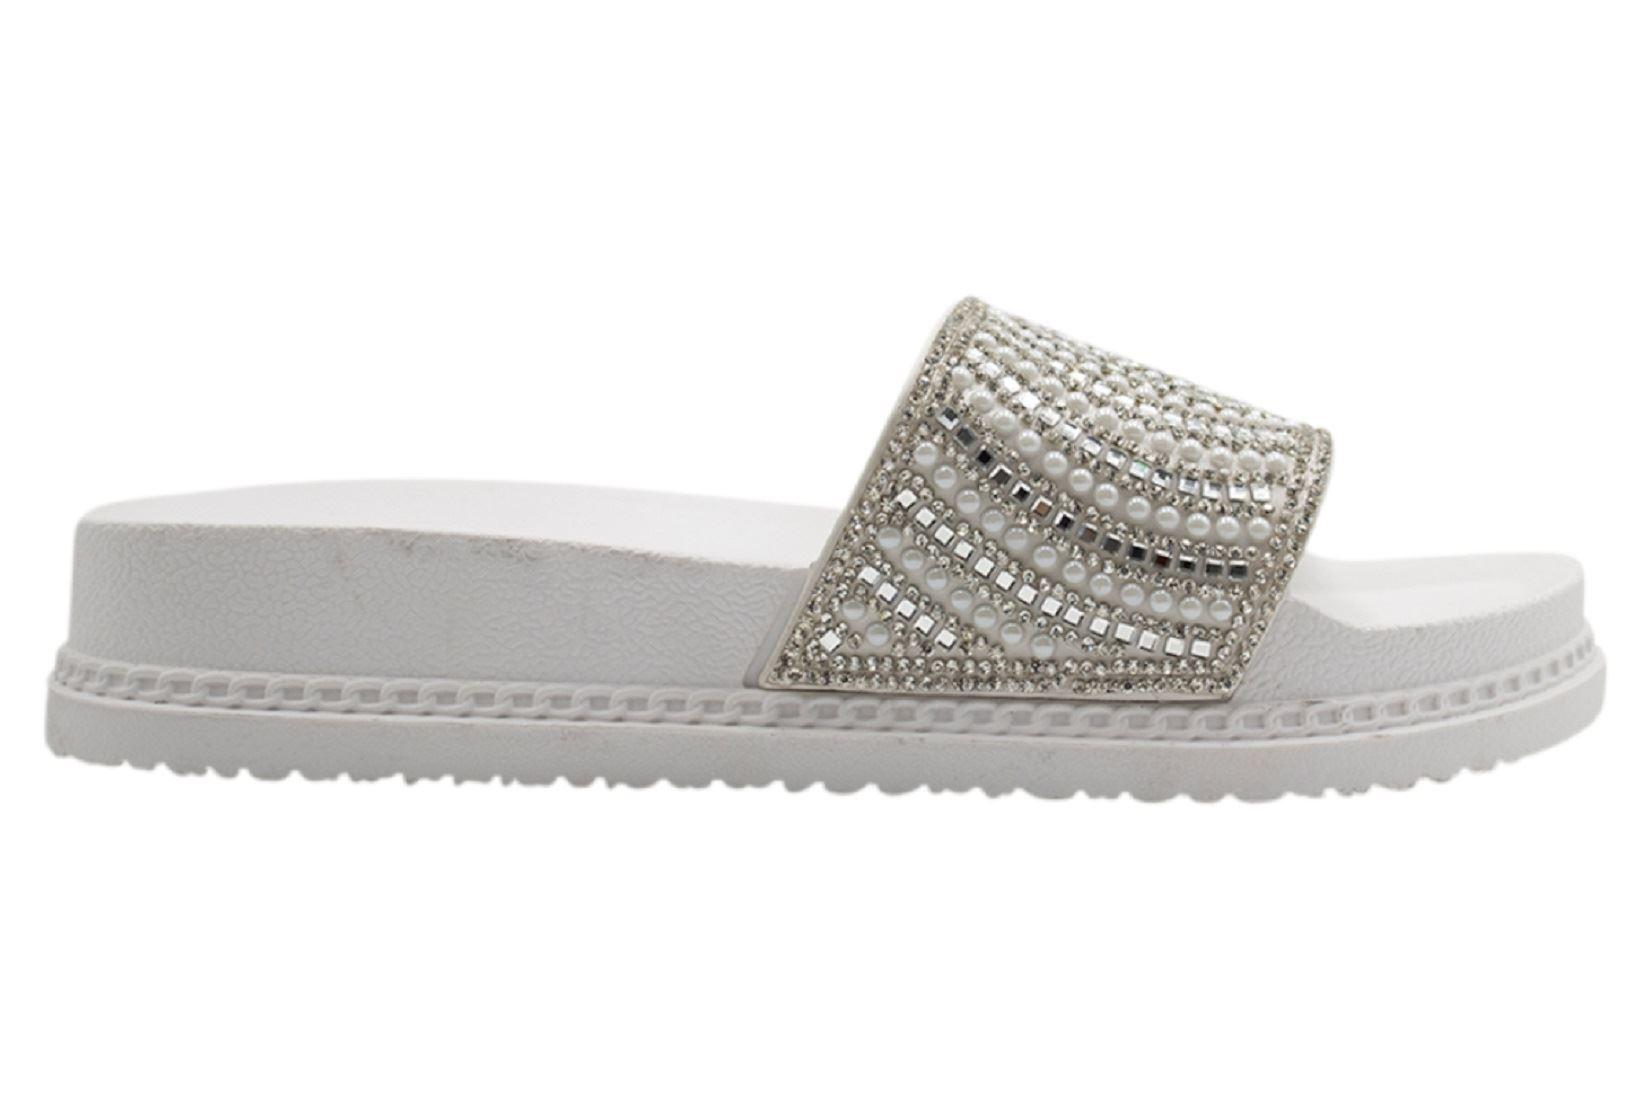 Womens-Sliders-Casual-Slippers-Mules-Ladies-Diamante-Flip-Flop-Sandals-Shoes thumbnail 101